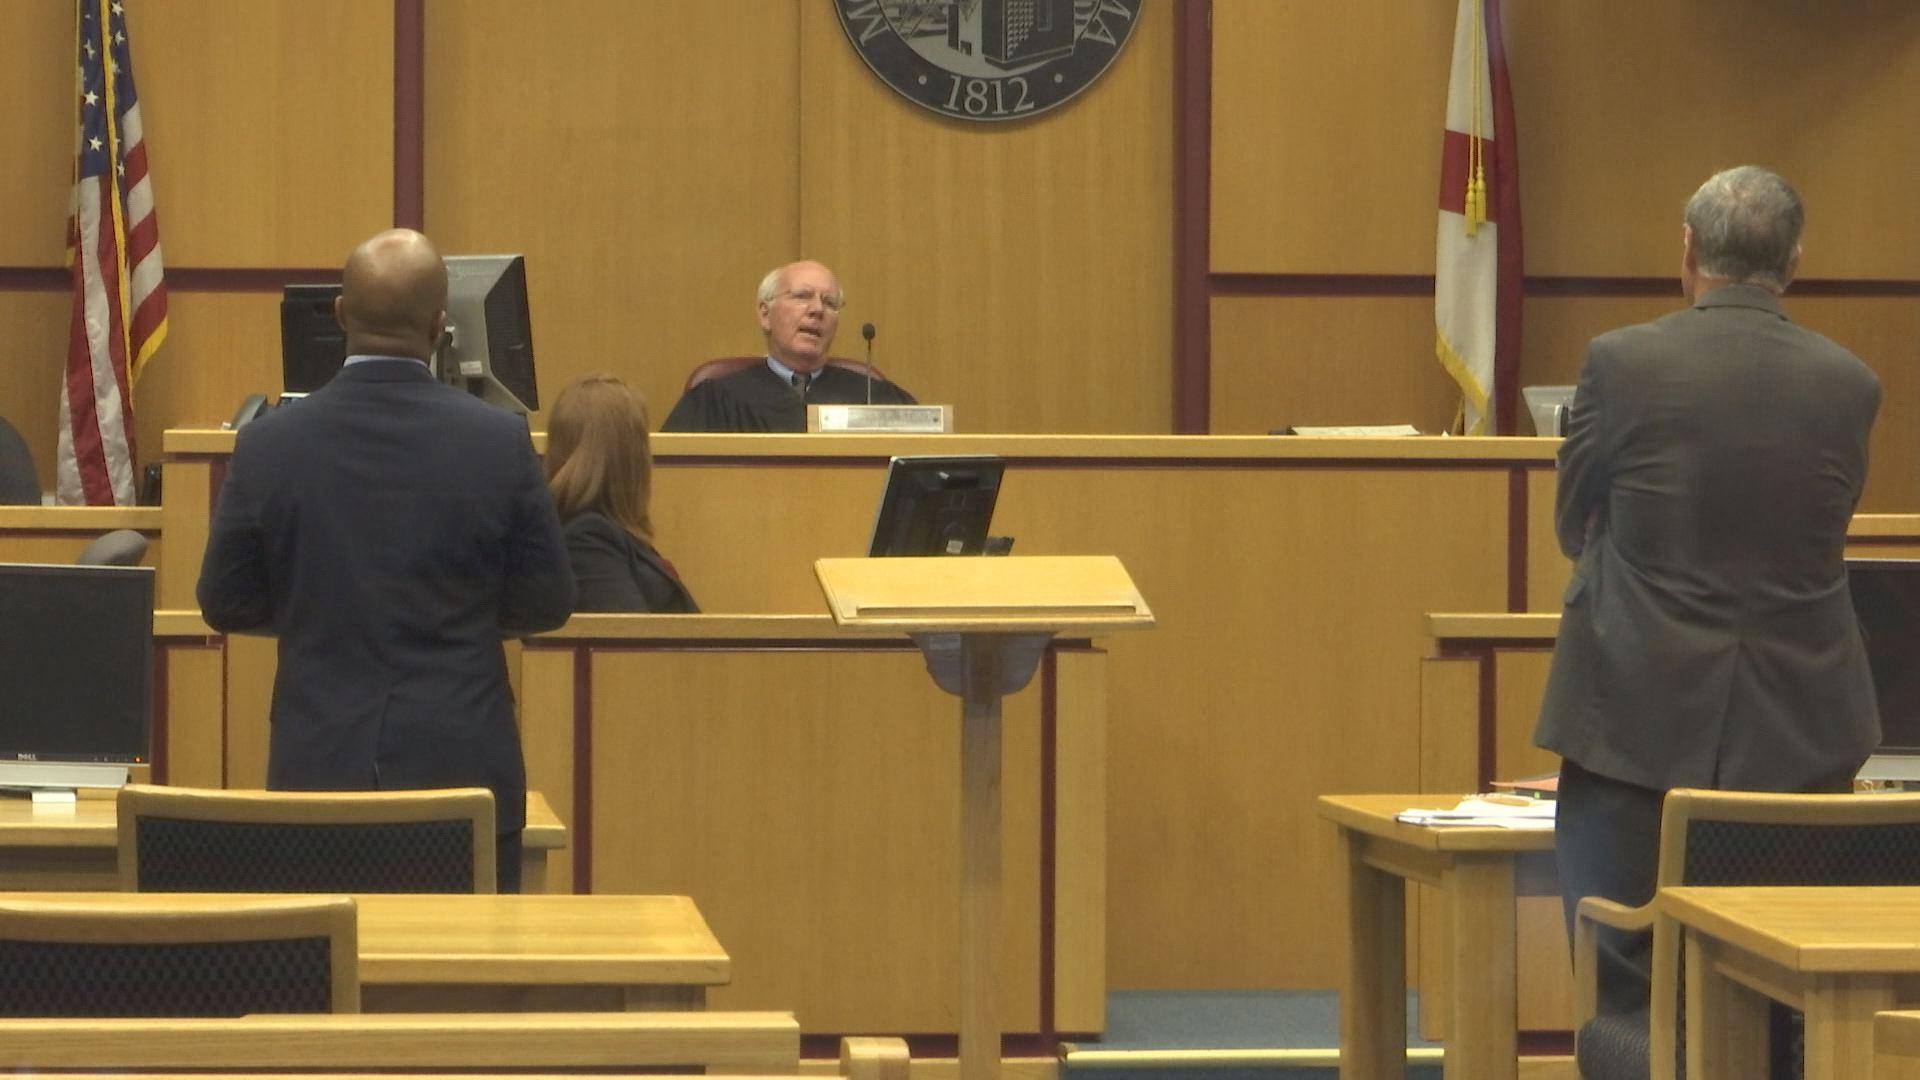 Attorneys representing Mobile and FOX10 News stood before Judge Rick Stout Friday morning, November 3. (Credit: Daeshen Smith, WALA)